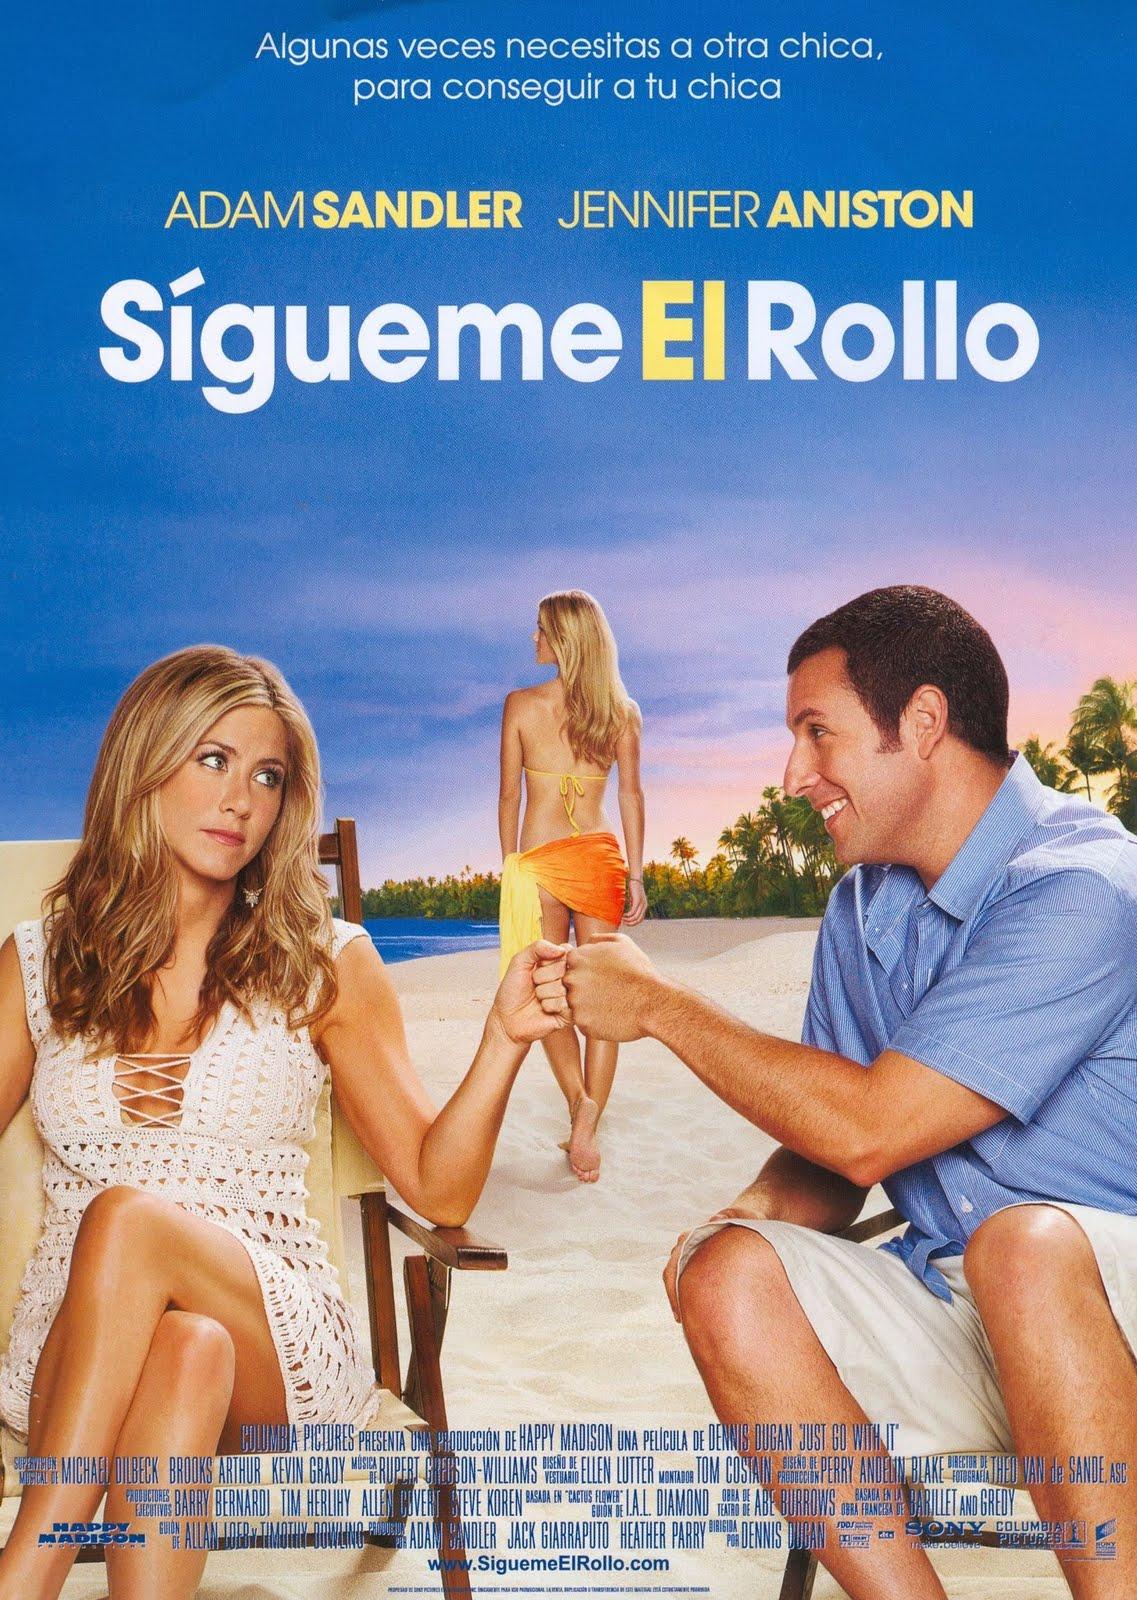 http://3.bp.blogspot.com/-VHl7g_VwkEc/TWIKRDXuAFI/AAAAAAAAGt8/FbL0kN9sGKI/s1600/Sigueme_El_Rollo.jpg